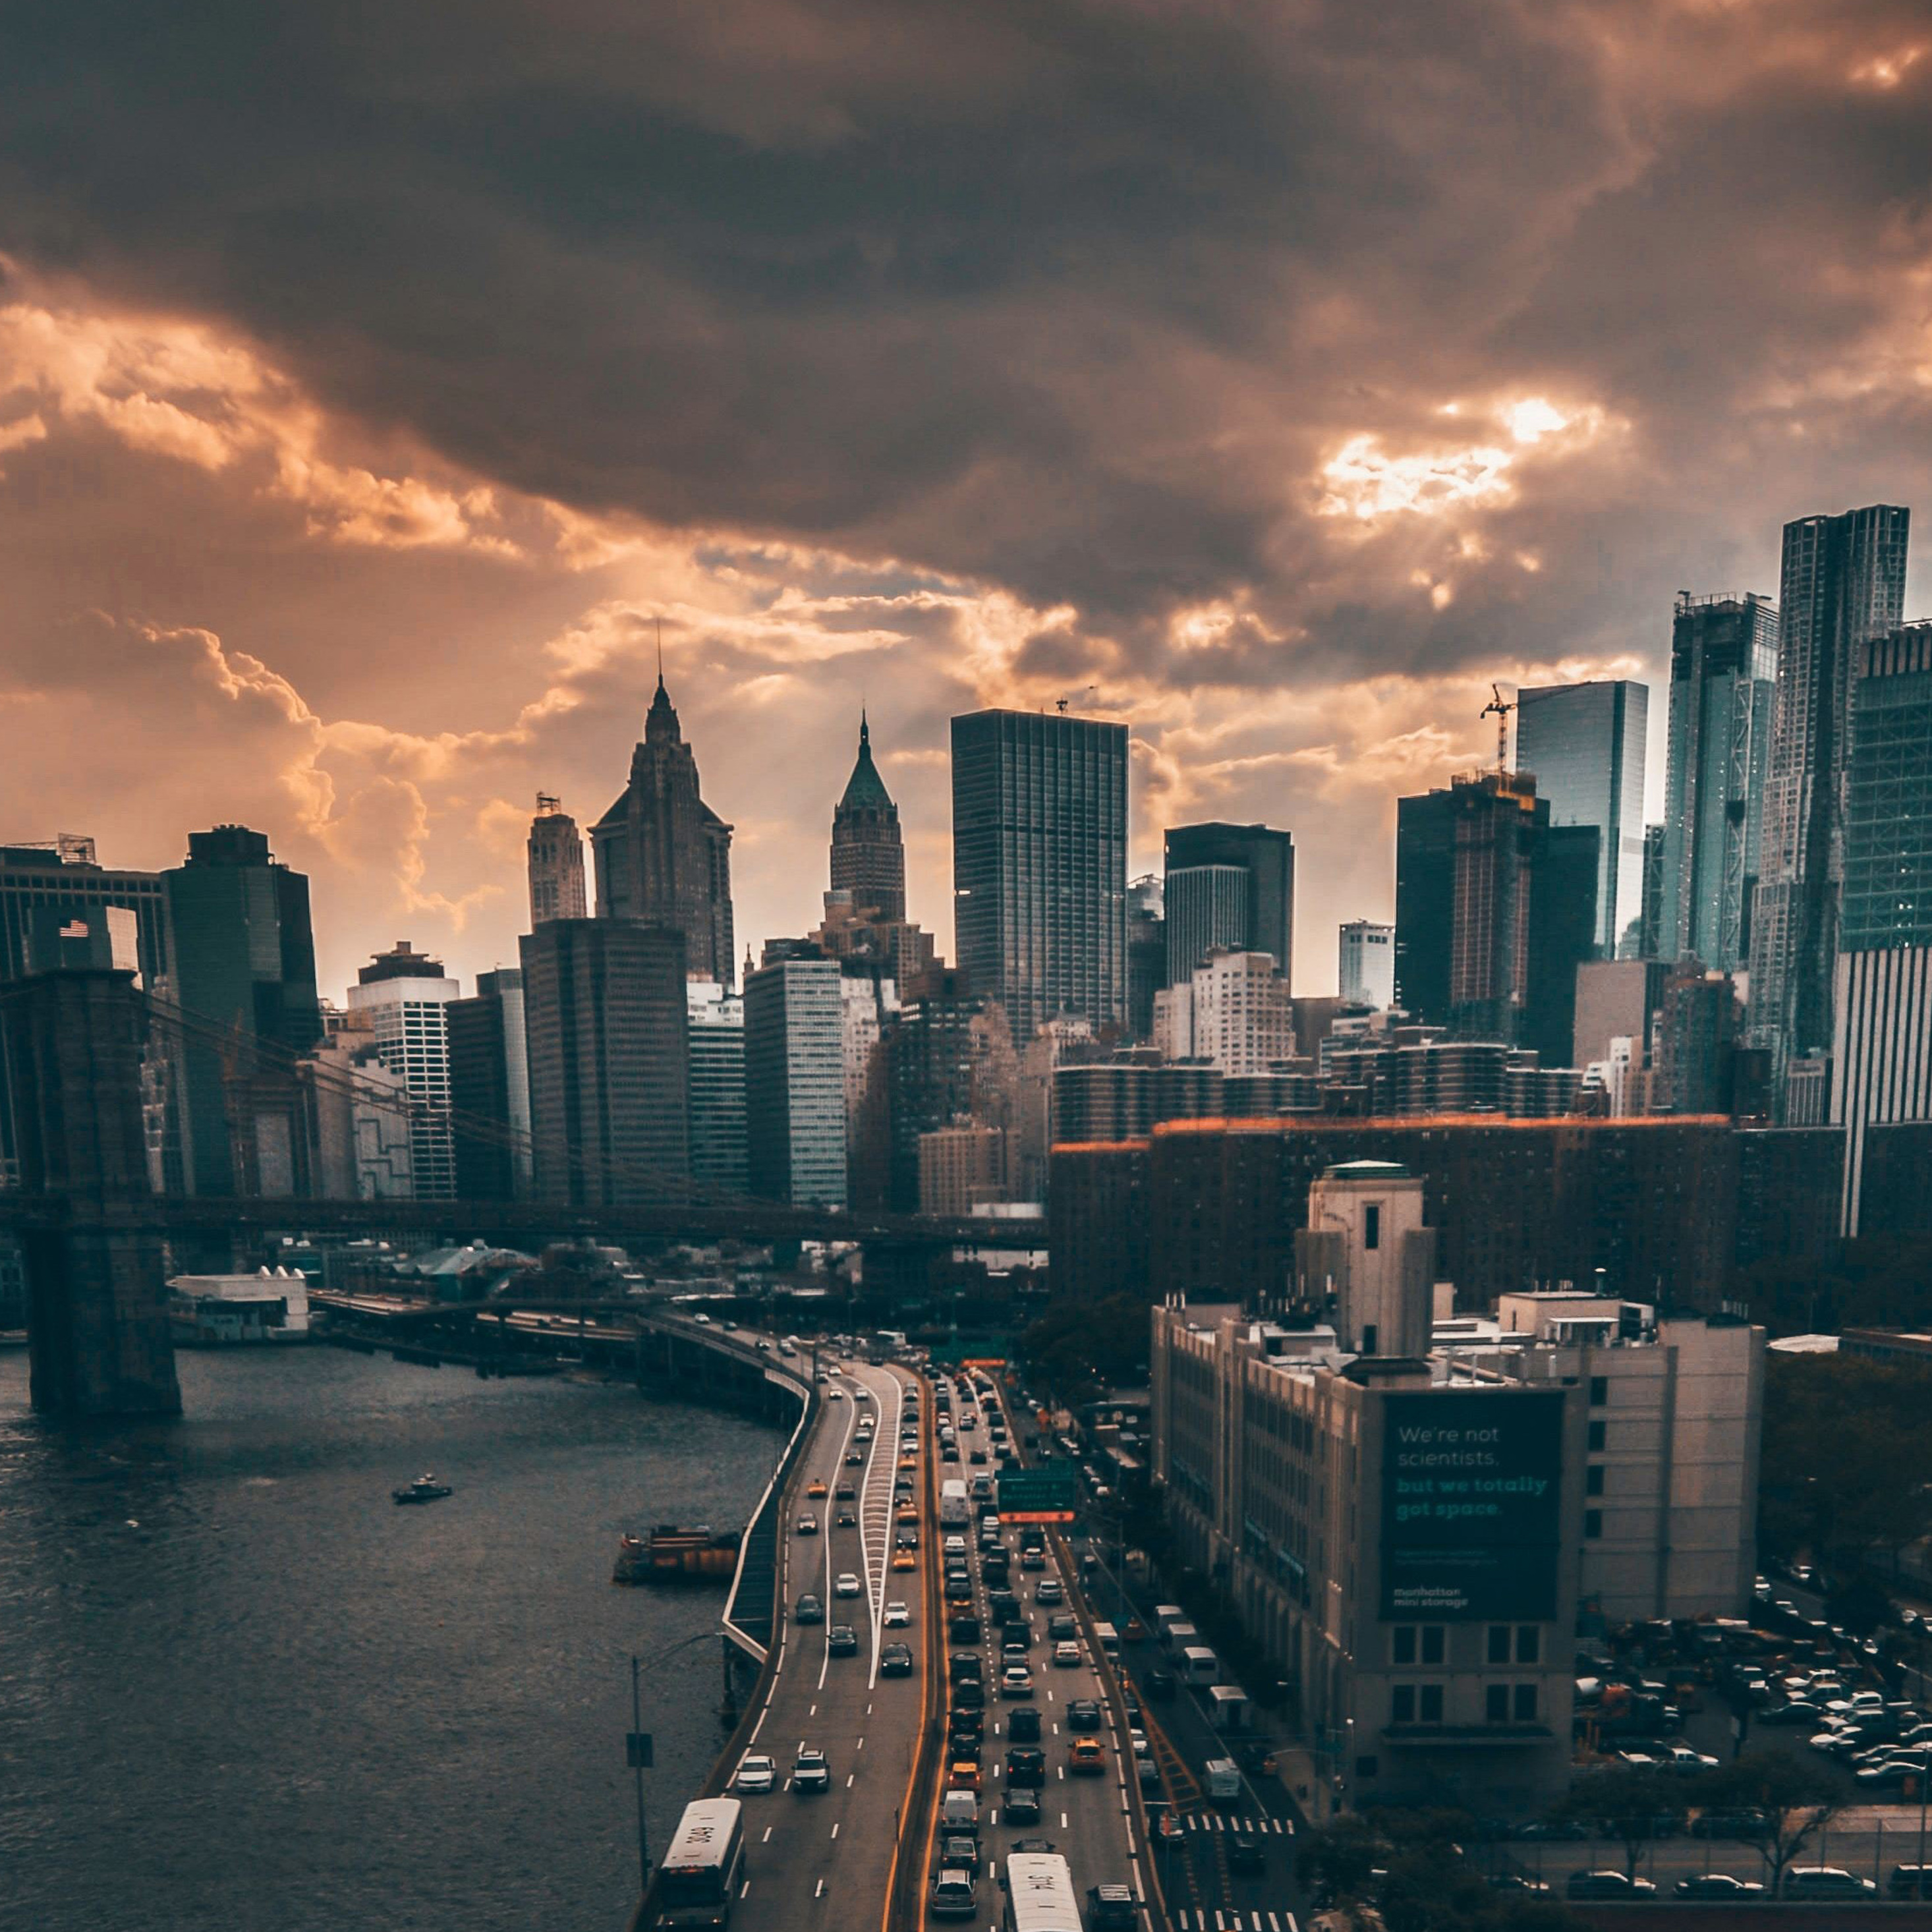 2932x2932 Manhattan New York City 4k ...